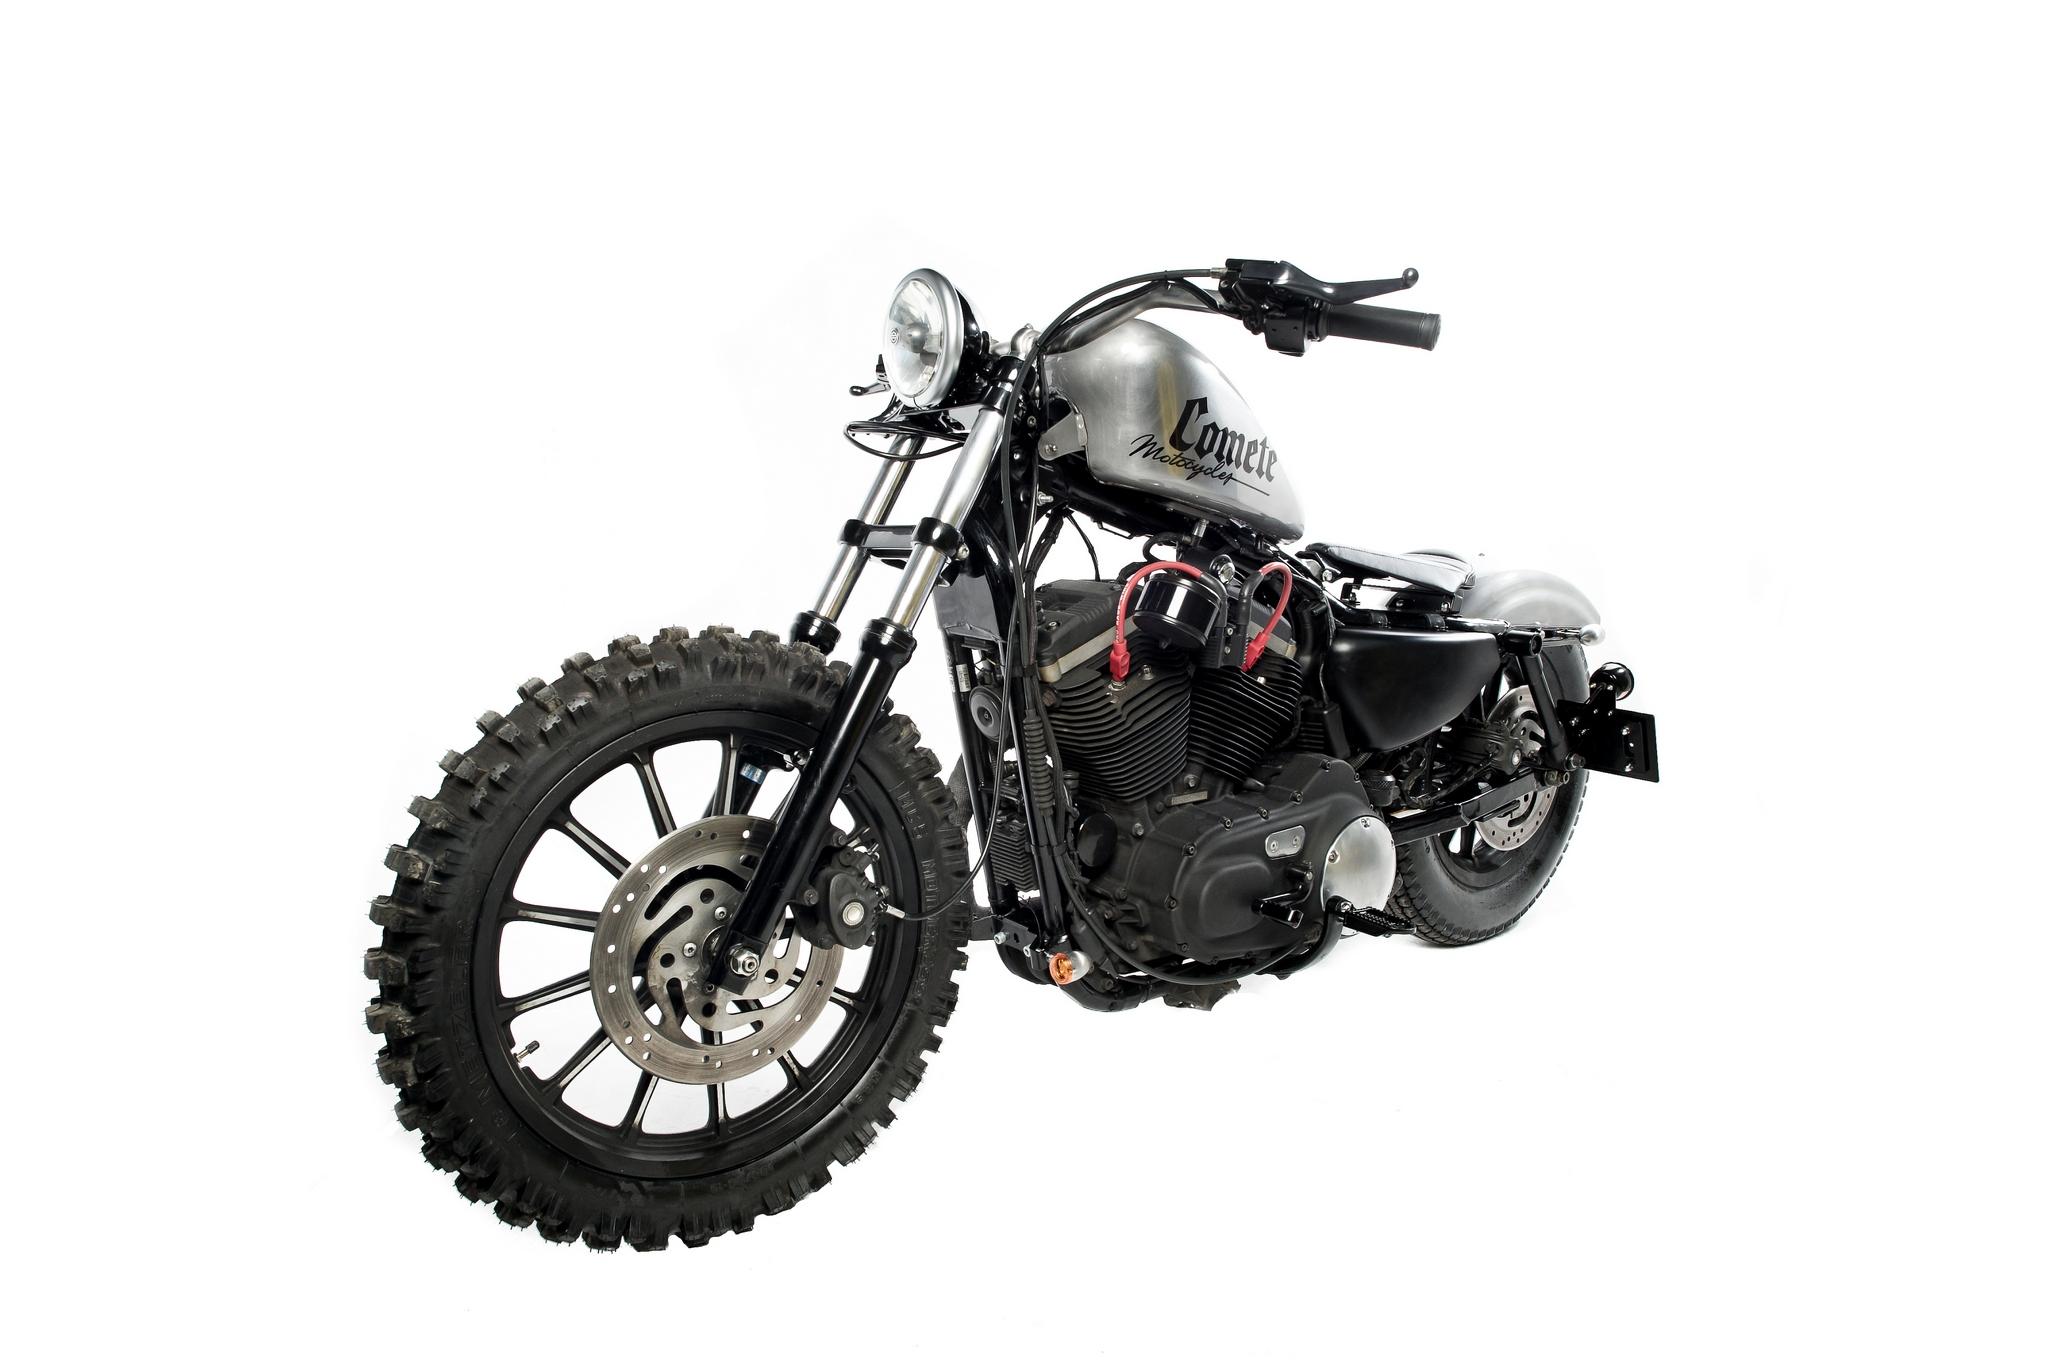 Lumberjack Sportster A Harley Scrambler From Comete Motocycles Photo Gallery on Sportster Dirt